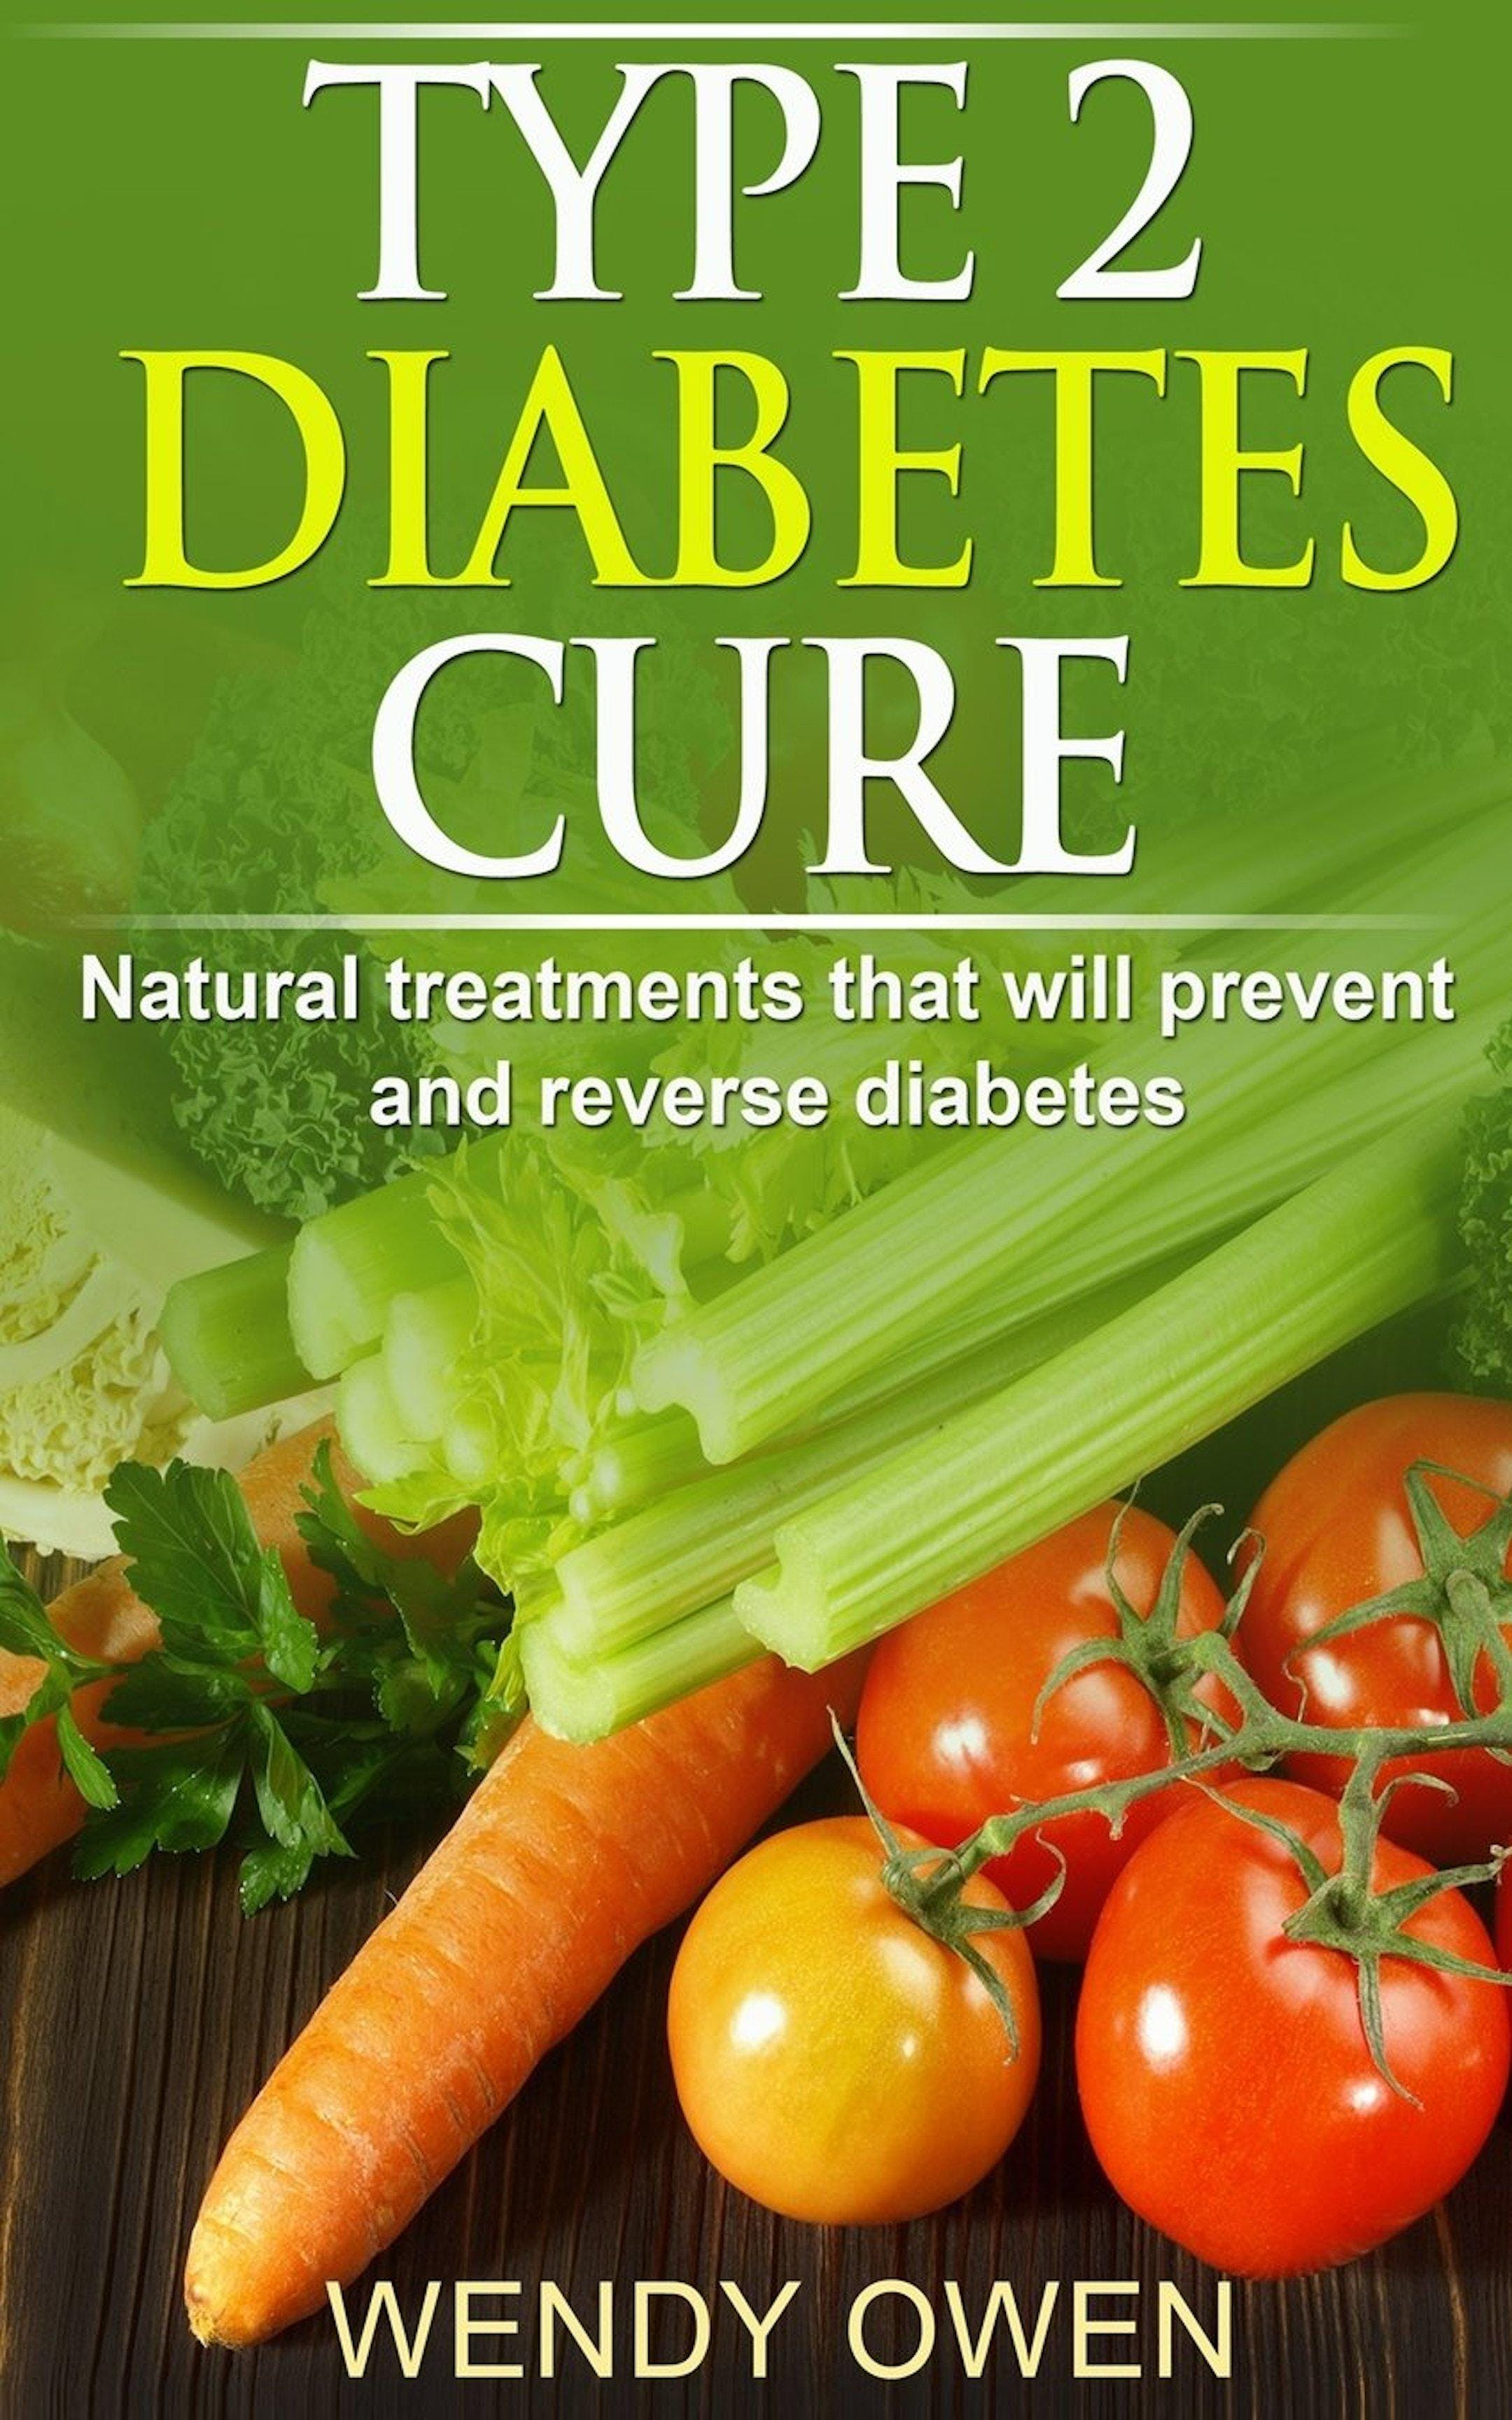 Type 2 Diabetes Reversal Workshop St. Cloud, Minnesota